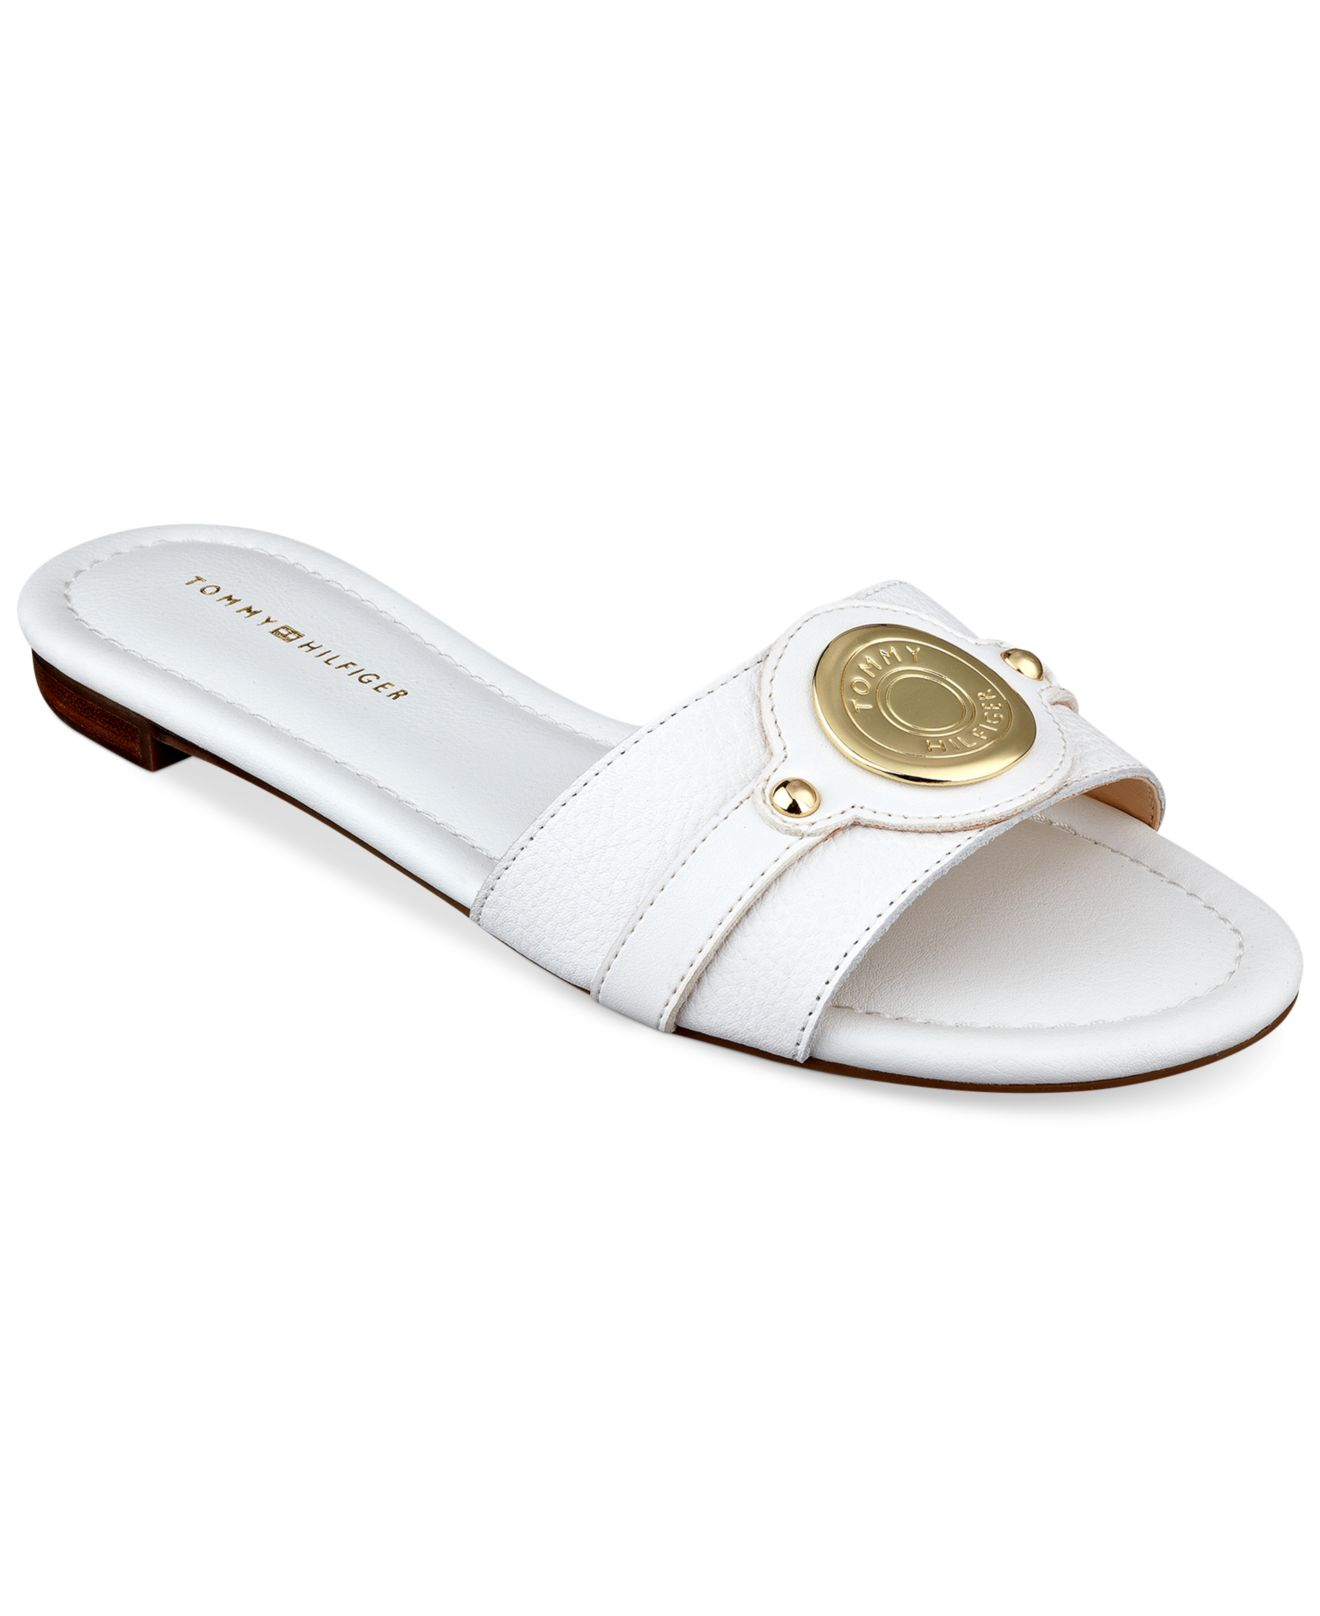 31d439e55 Lyst - Tommy Hilfiger Women s Icela Slide Sandals in White